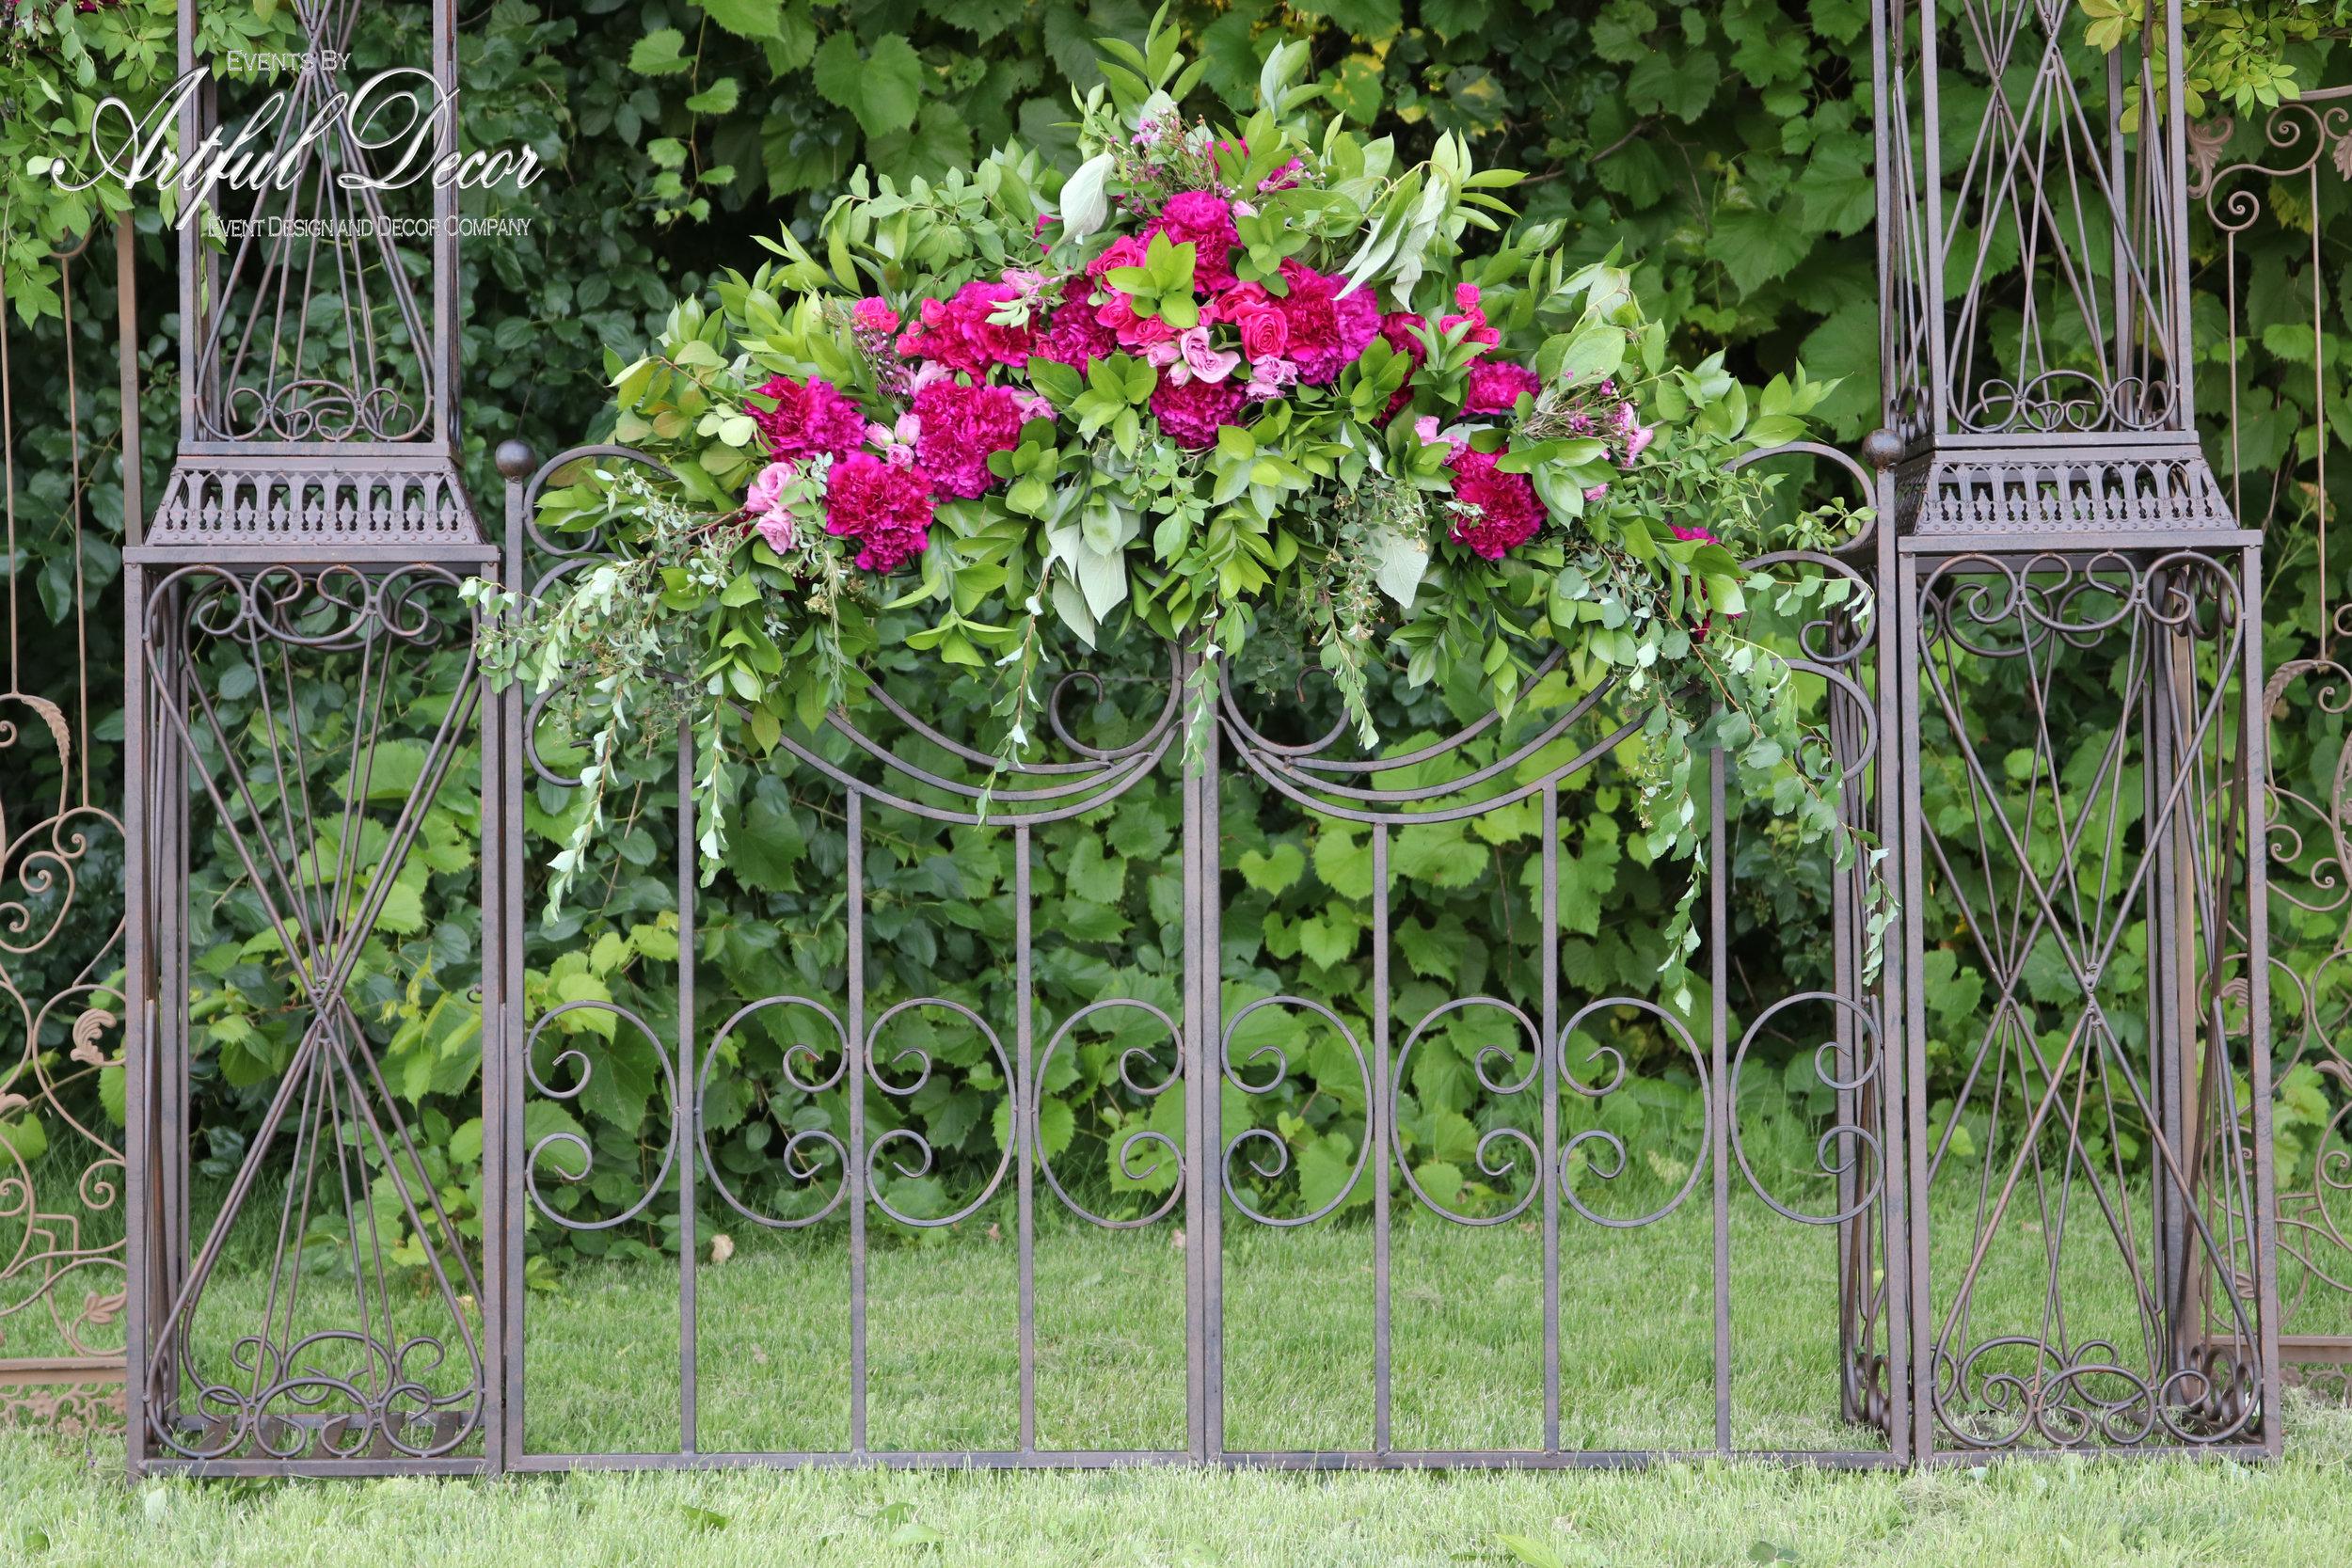 Garden Gate 22 Copyright.jpg